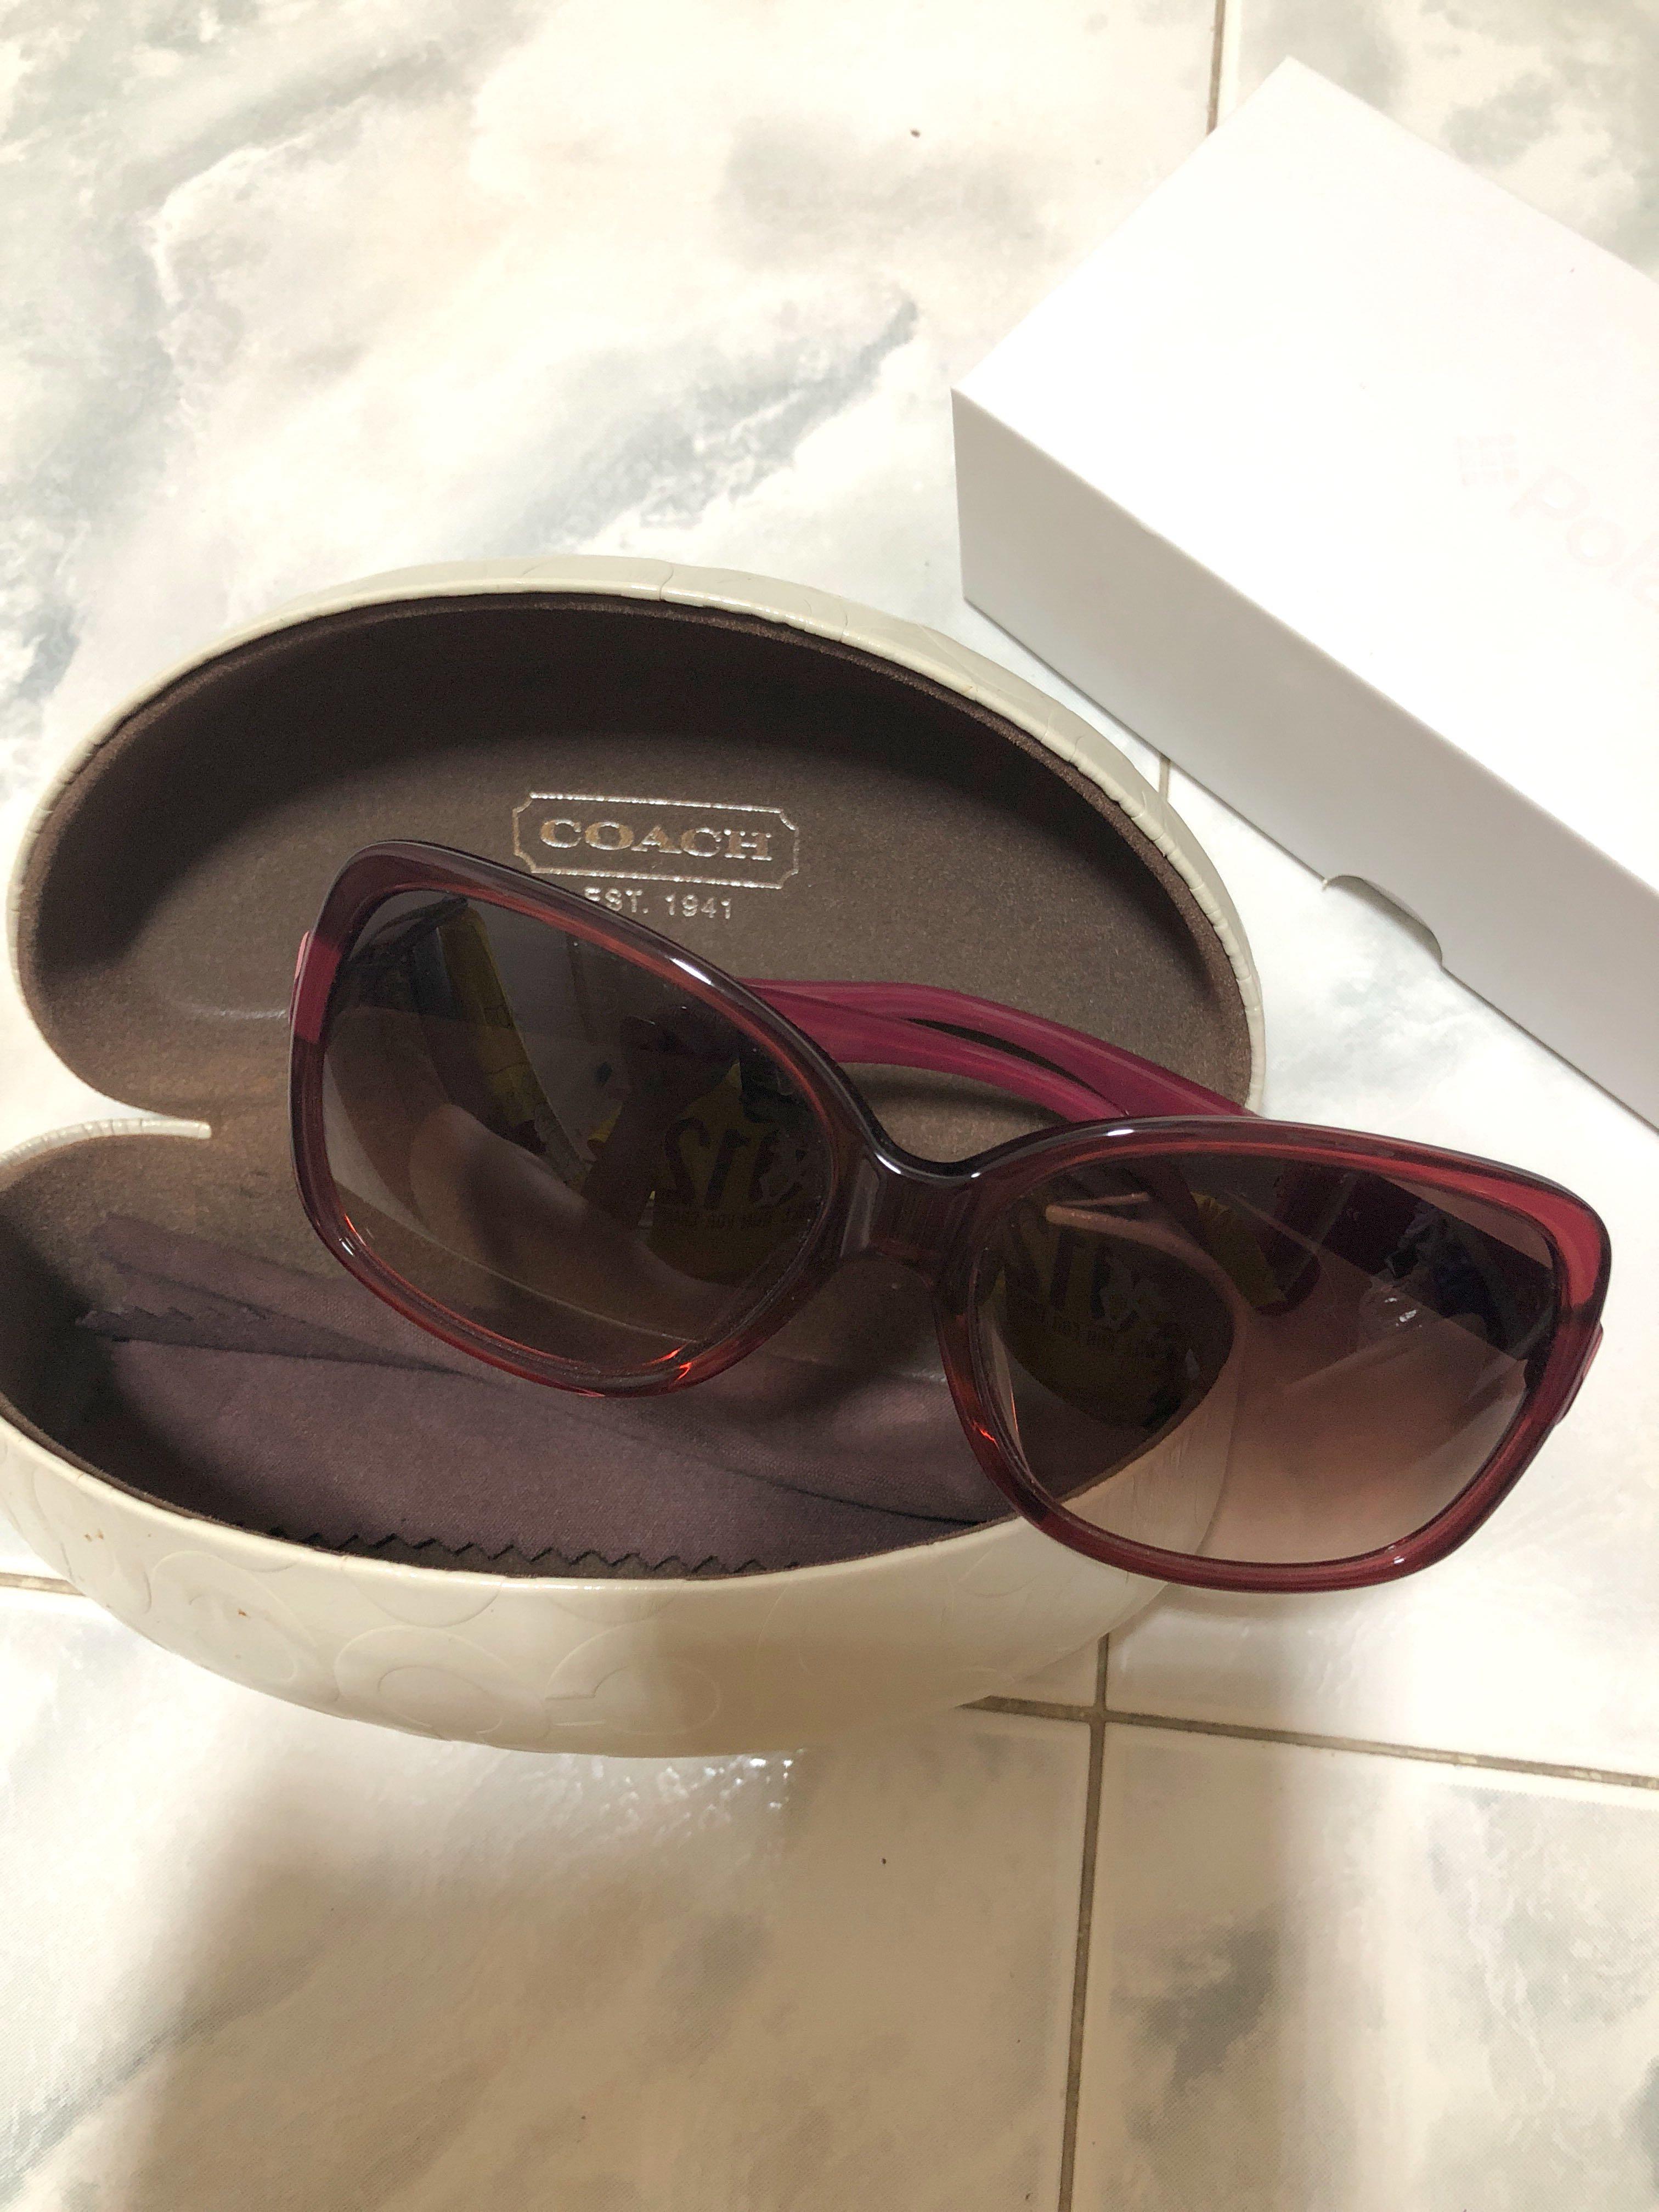 89680476d8fe Home · Women s Fashion · Accessories · Eyewear   Sunglasses. photo photo ...